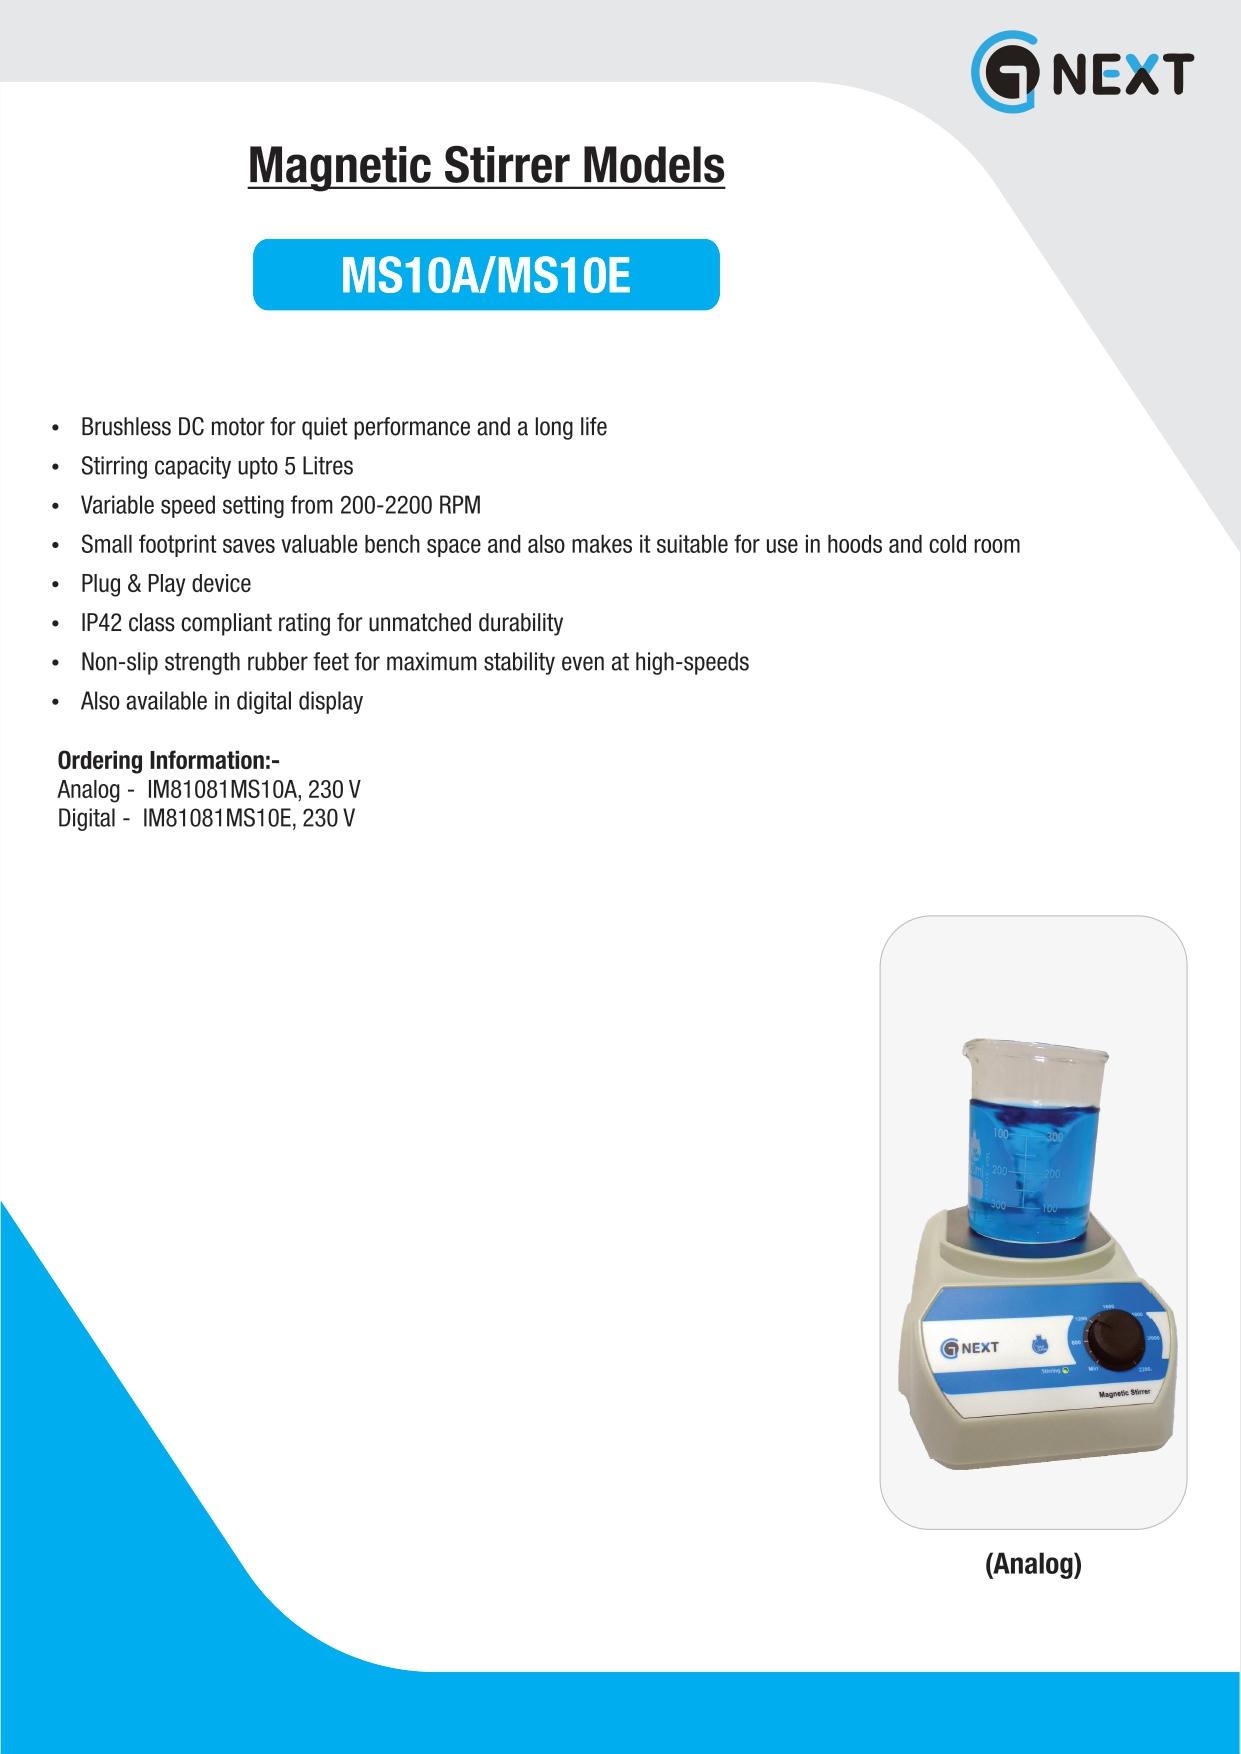 Analog Magnetic Stirrer